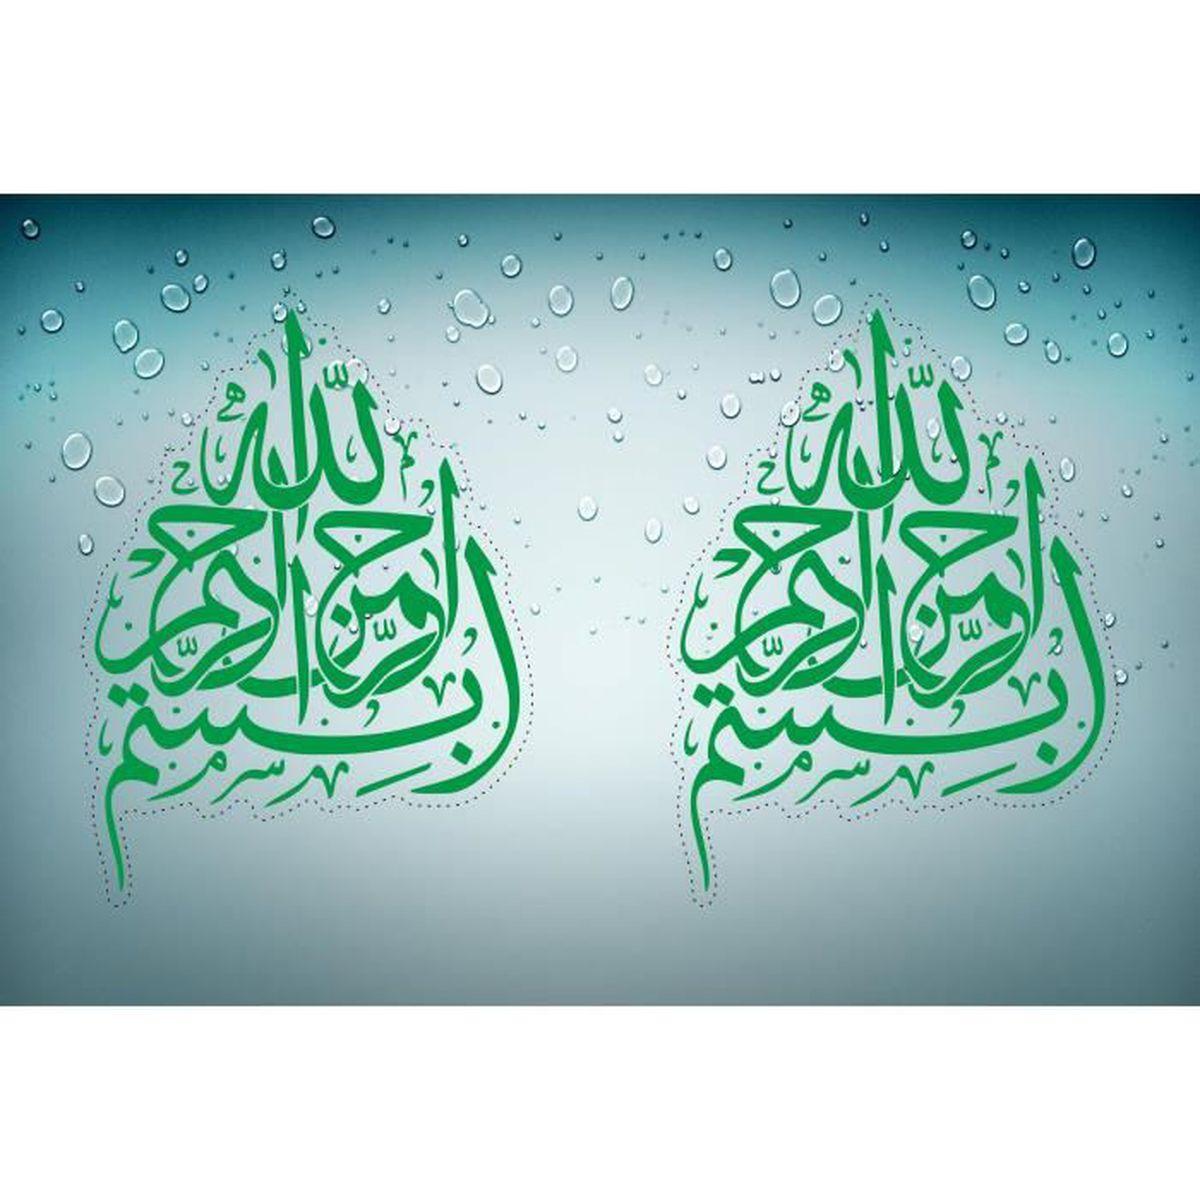 Stickers Islam Pas Cher autocollant sticker voiture moto taille islam calligraphie arabe bismillah  r4